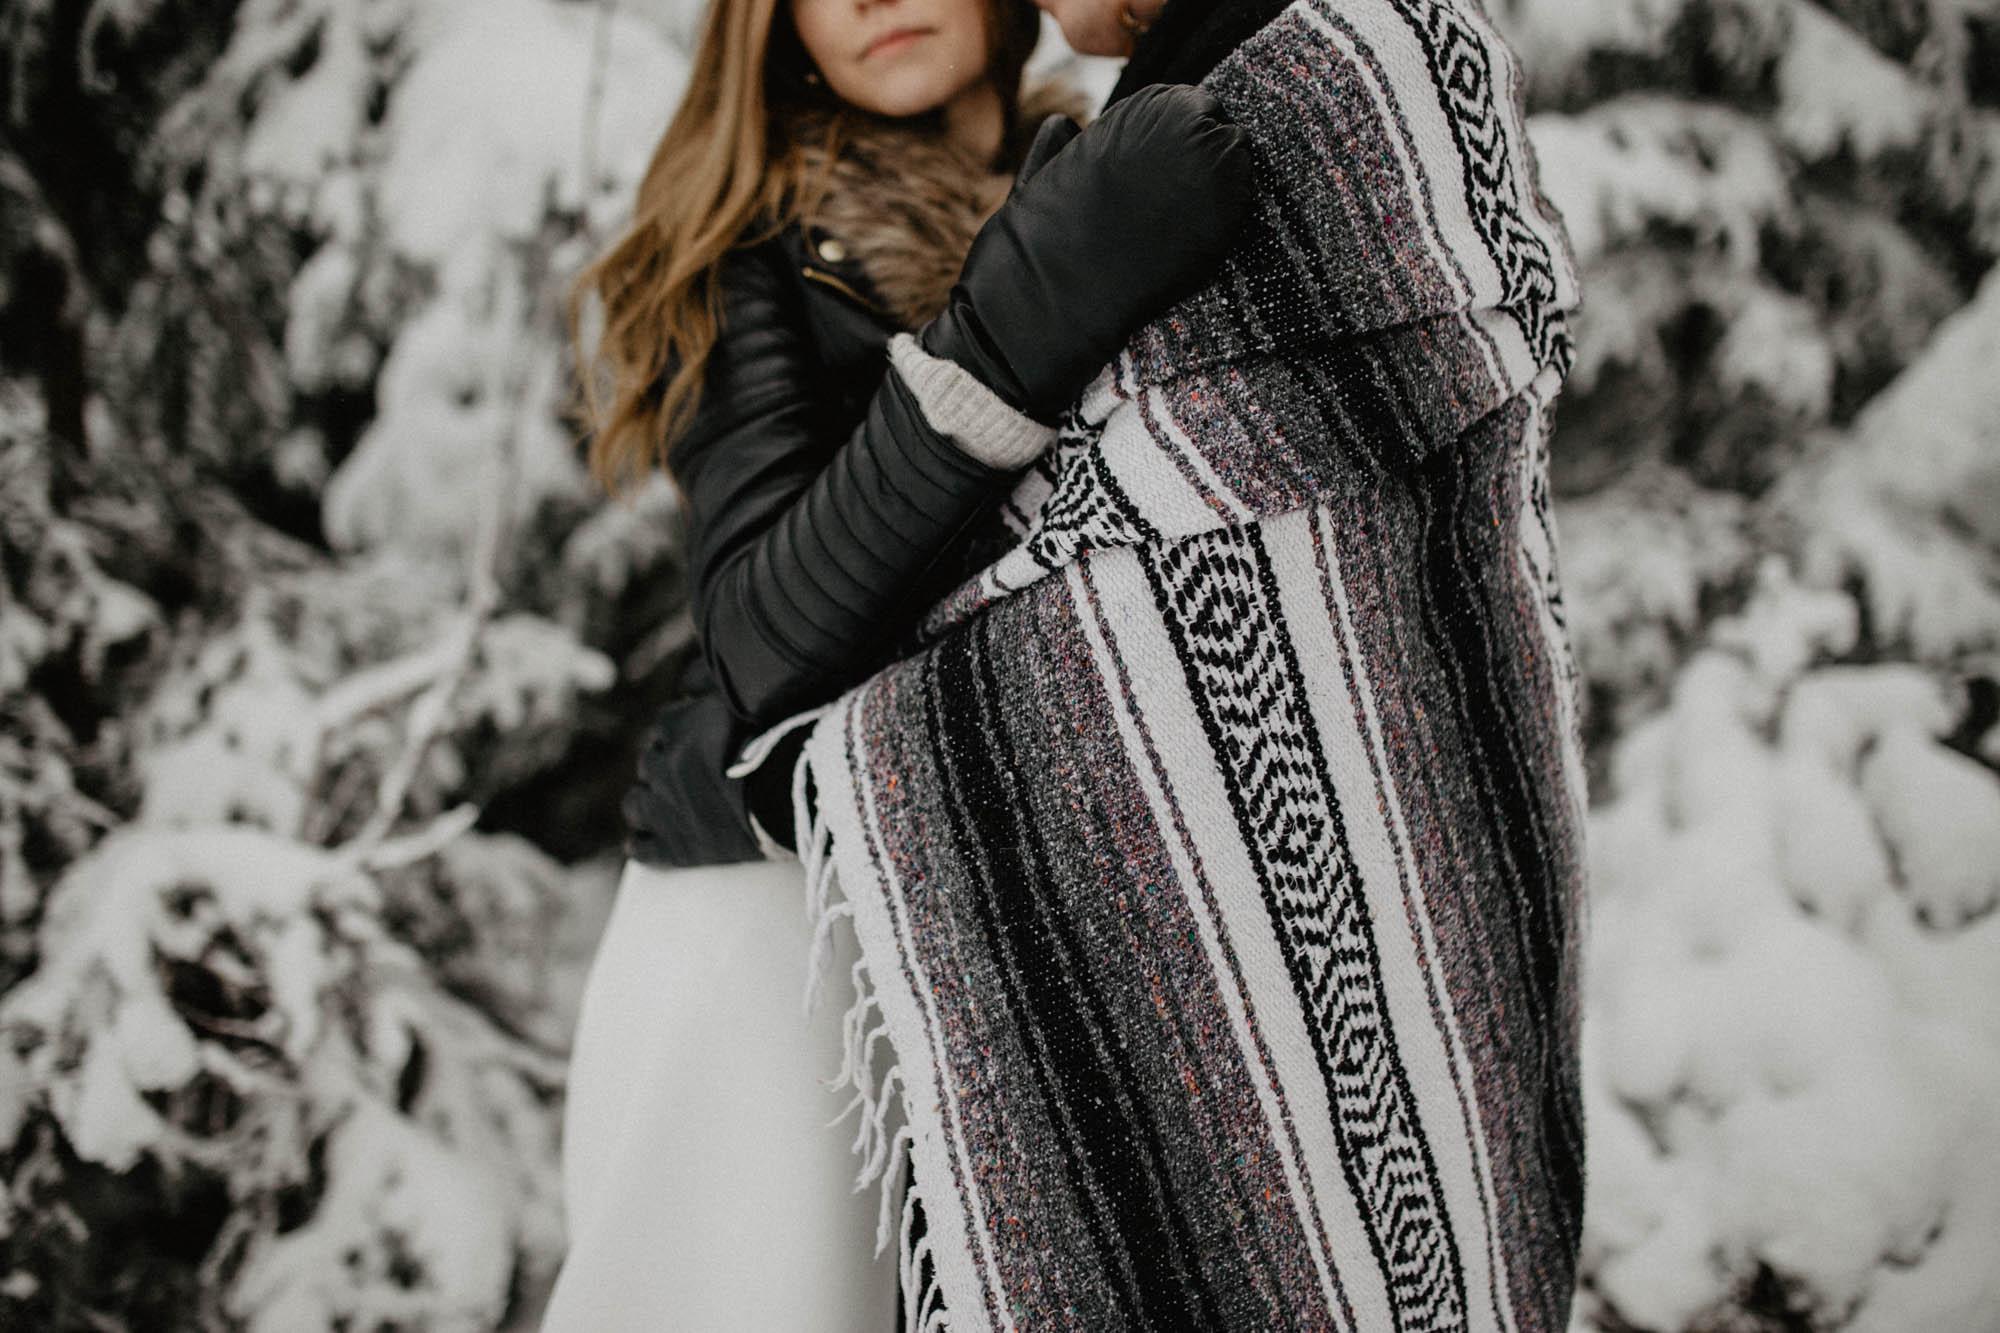 ashley_schulman_photography-winter_wedding_tampere-32.jpg